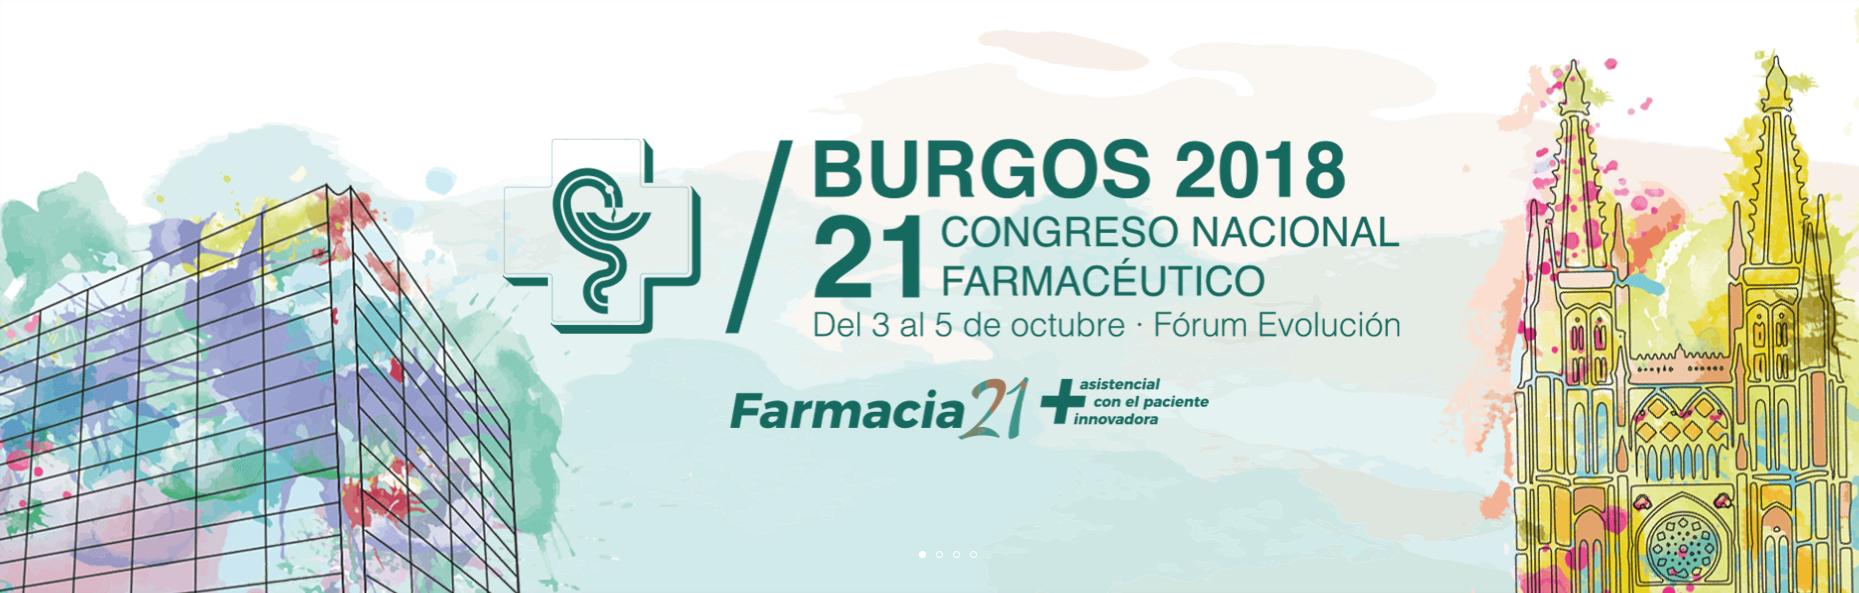 Farmamundi acude al 21 Congreso Nacional Farmacéutico